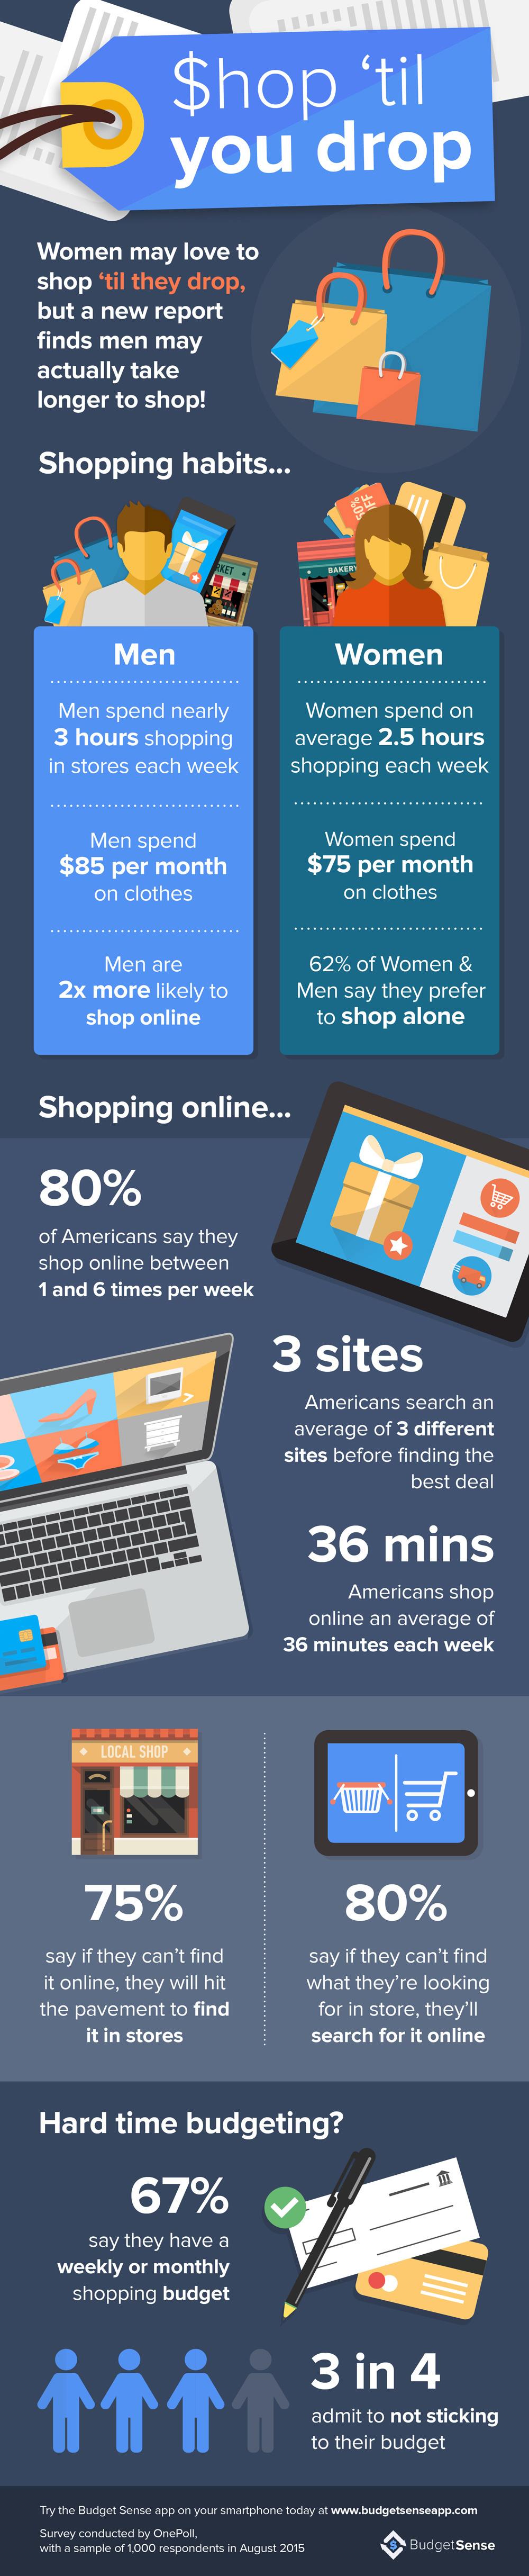 budget sense shopping infographic